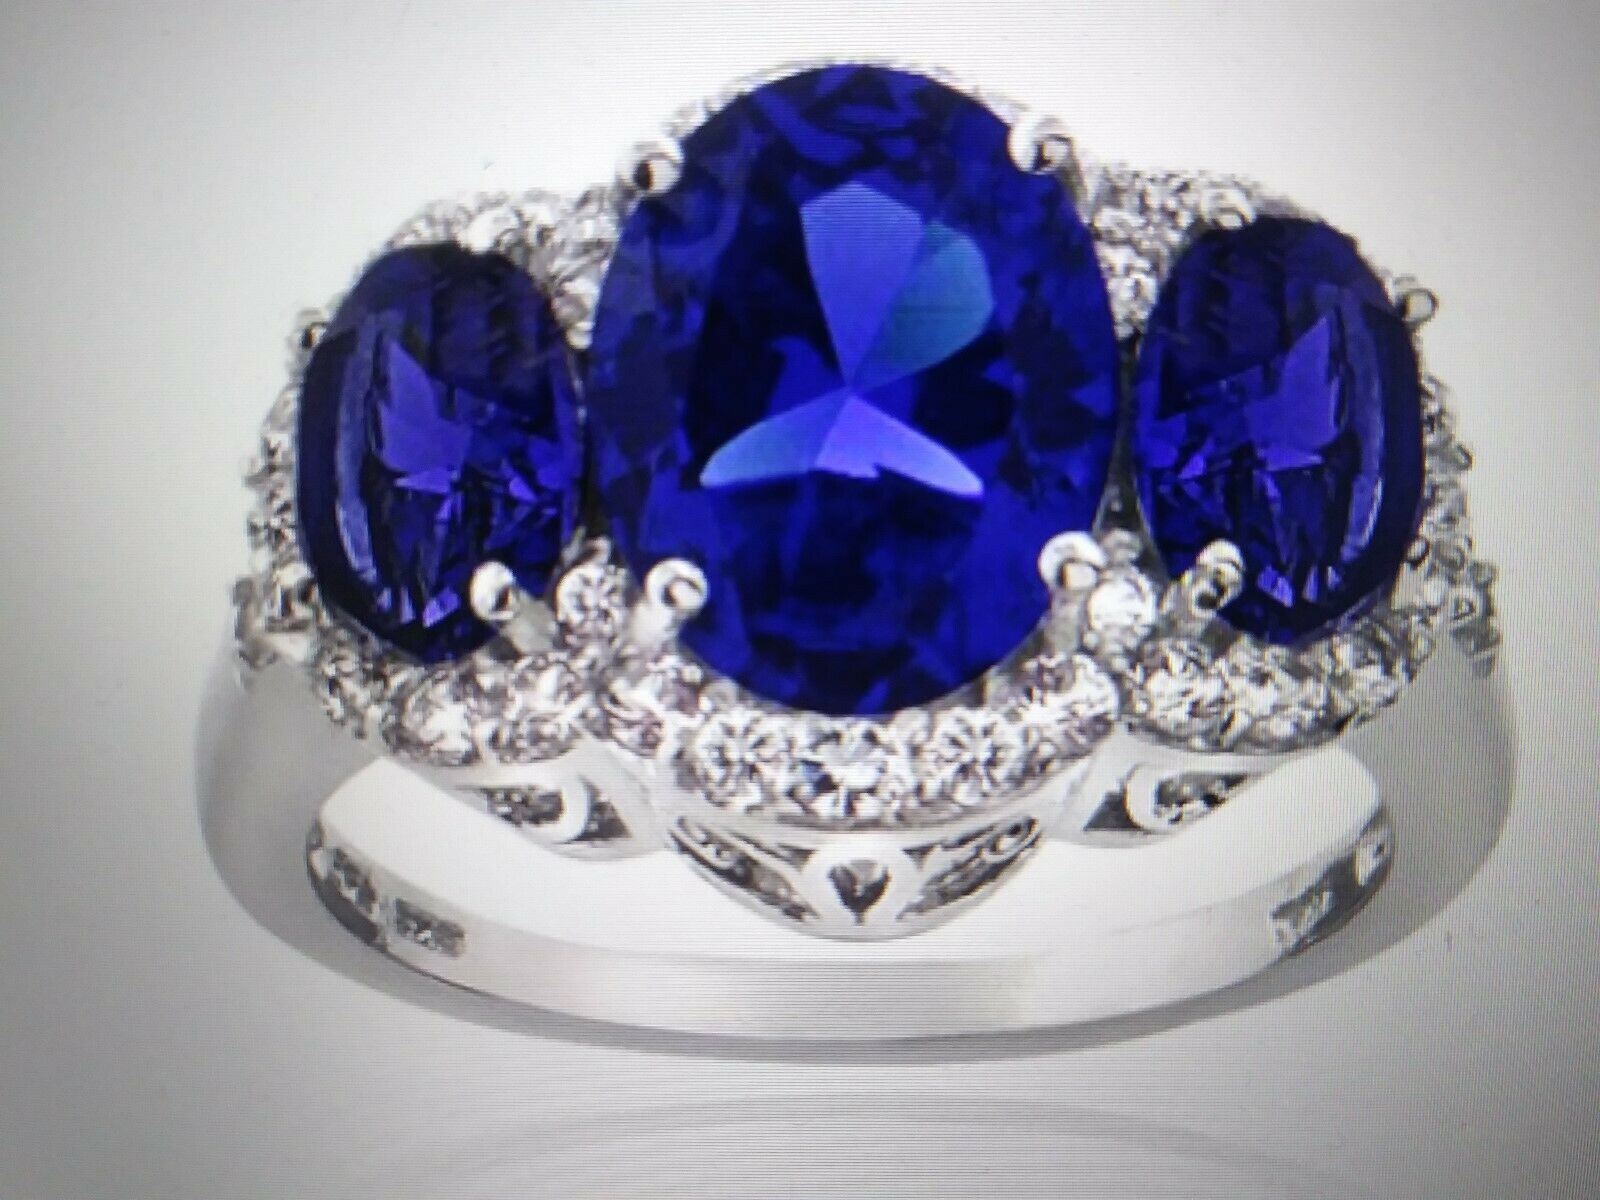 PLATINUM & SS 3 STONE blueE SAPPHIRE DIAMOND ENGAGEMENT WEDDING RING SZ 7 + GIFT